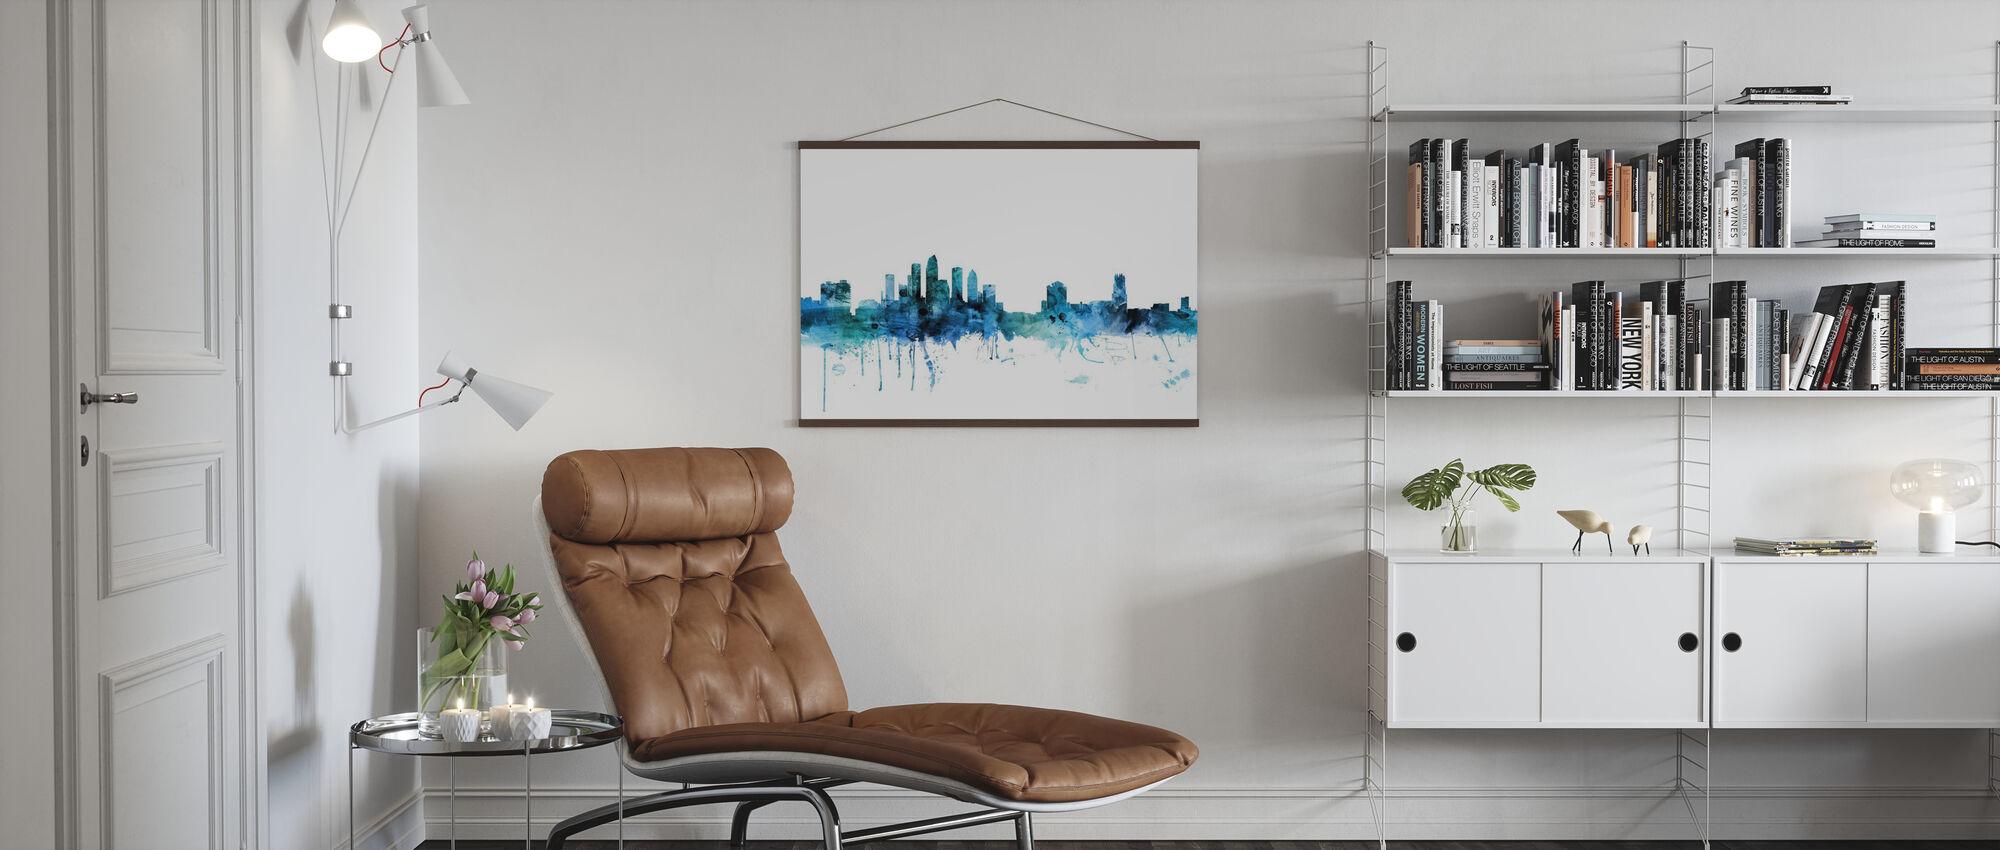 Tampa Florida Skyline - Poster - Living Room